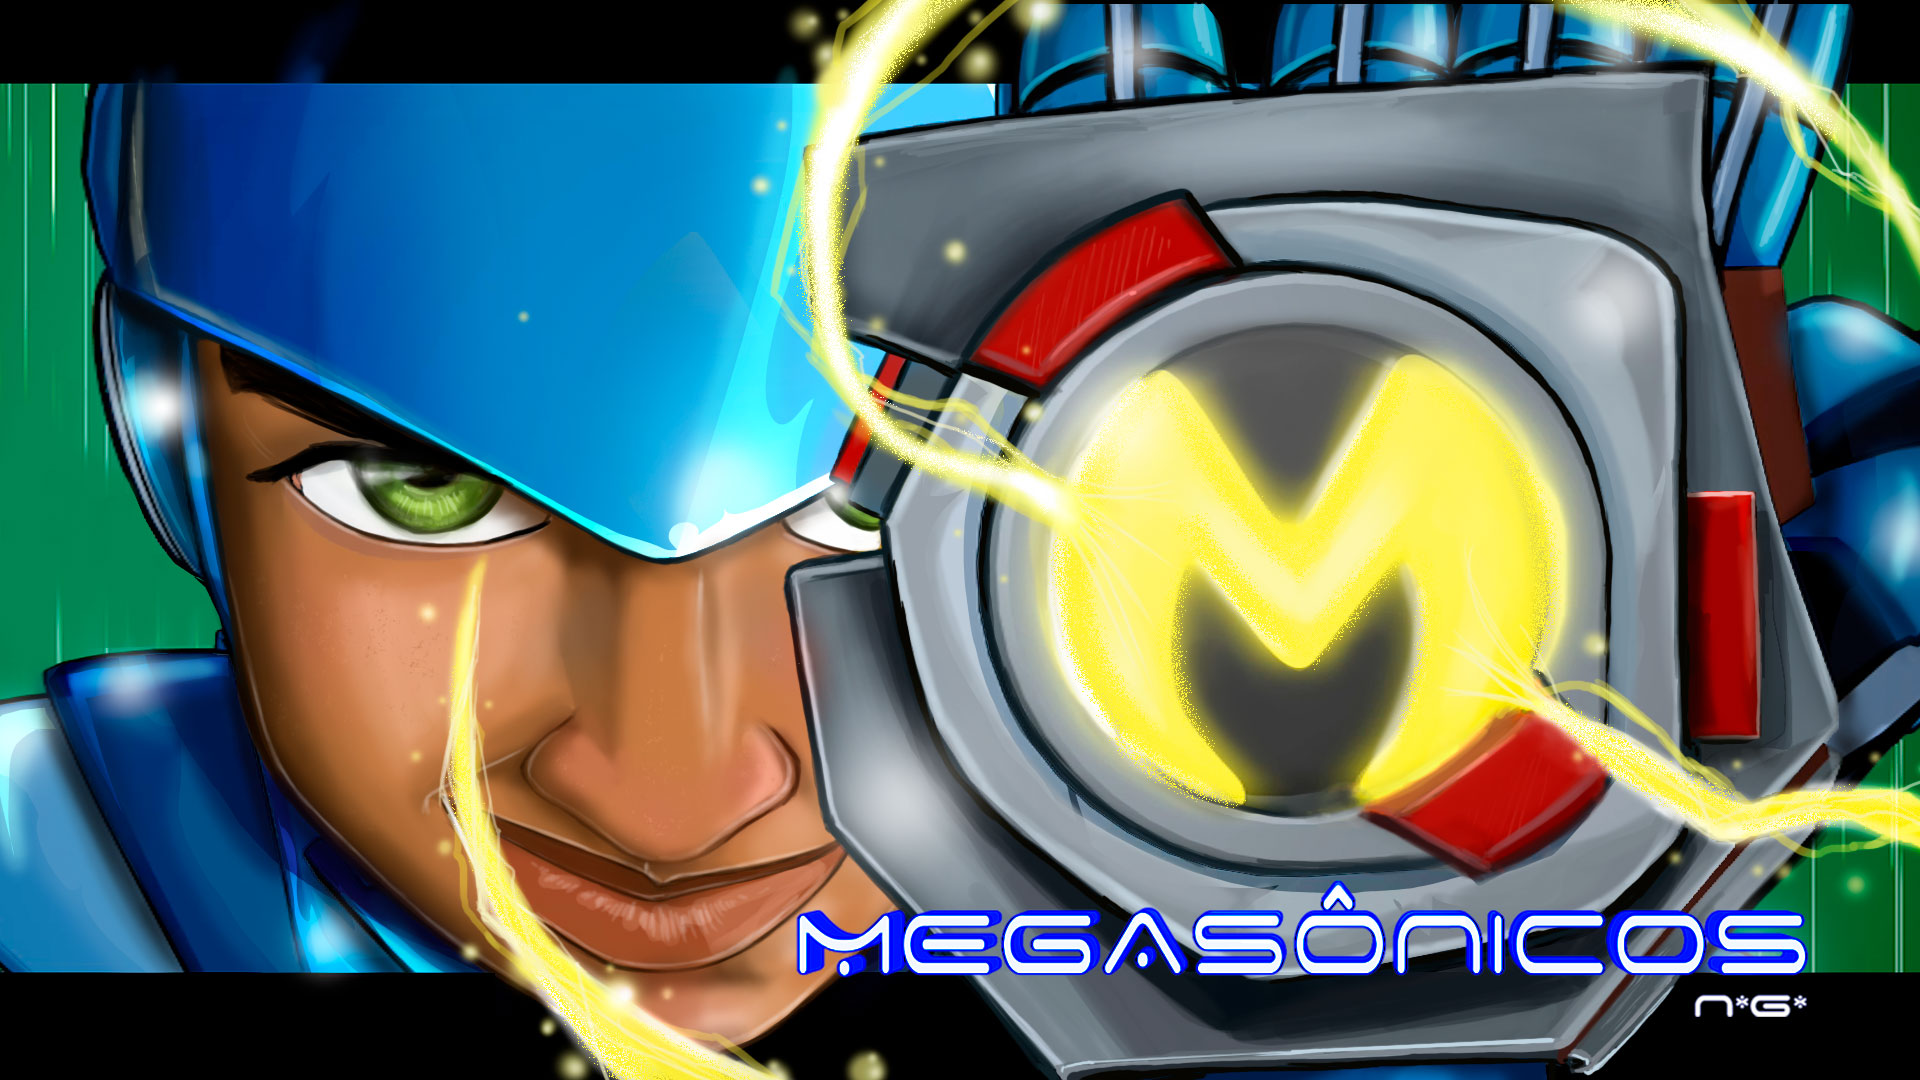 Megasônicos Power